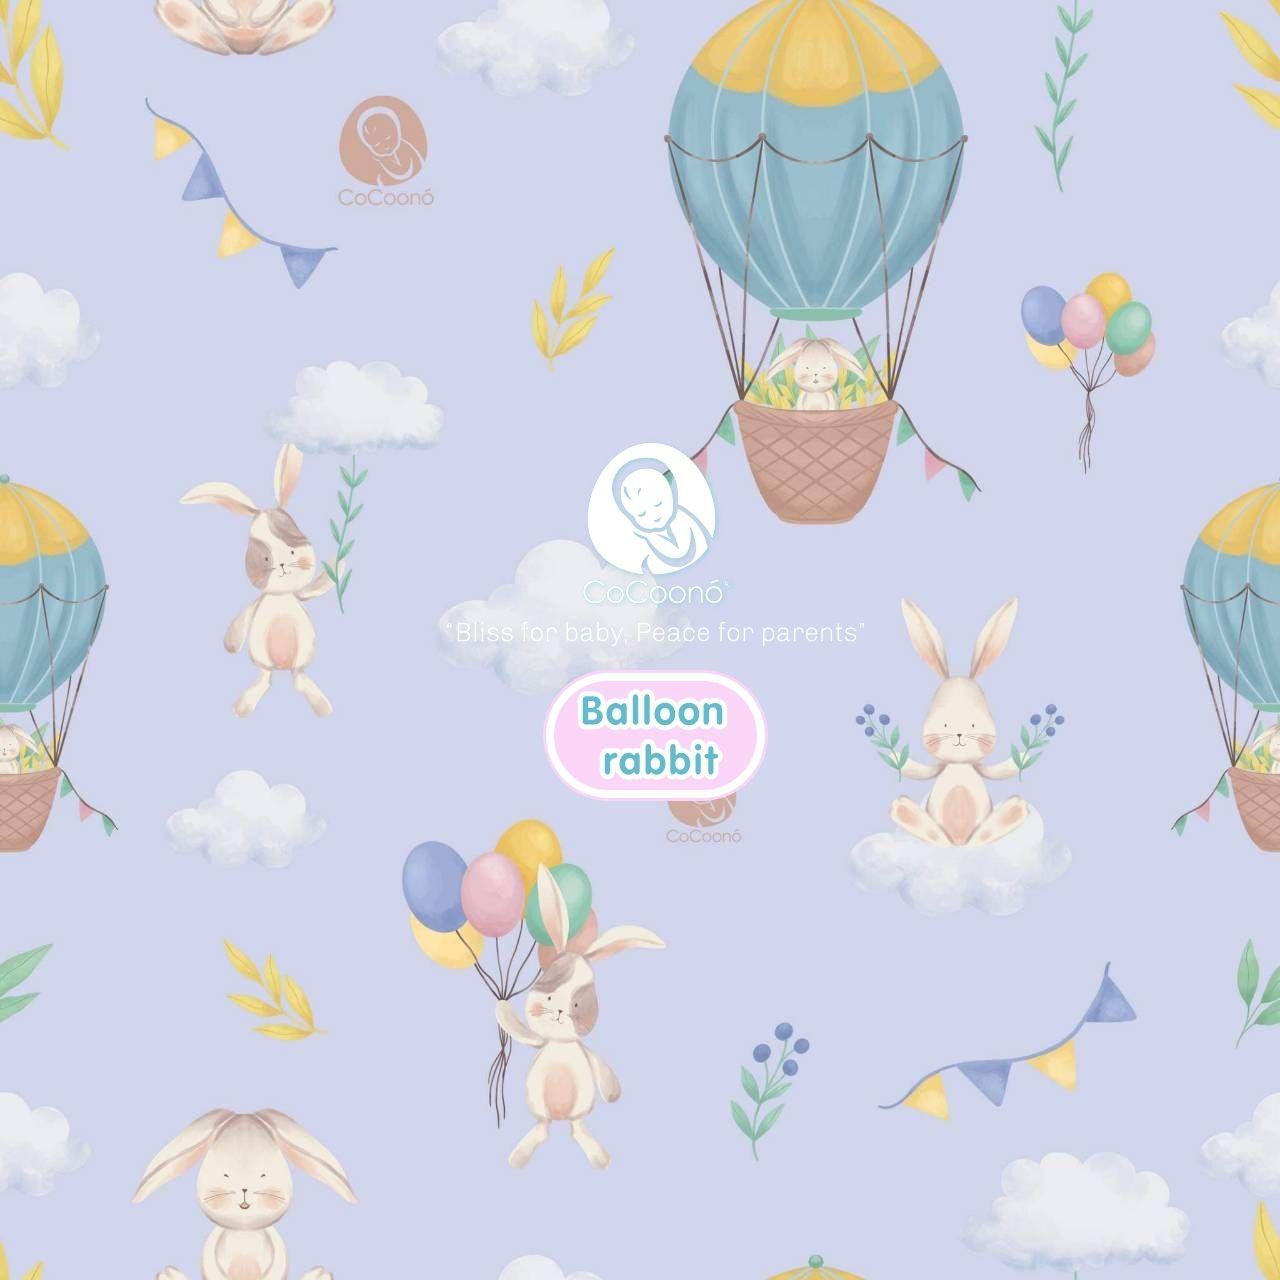 Baby latex pillow (หมอนหลุมยางพาราสำหรับเด็ก 4-เดือนขึ้นไป)